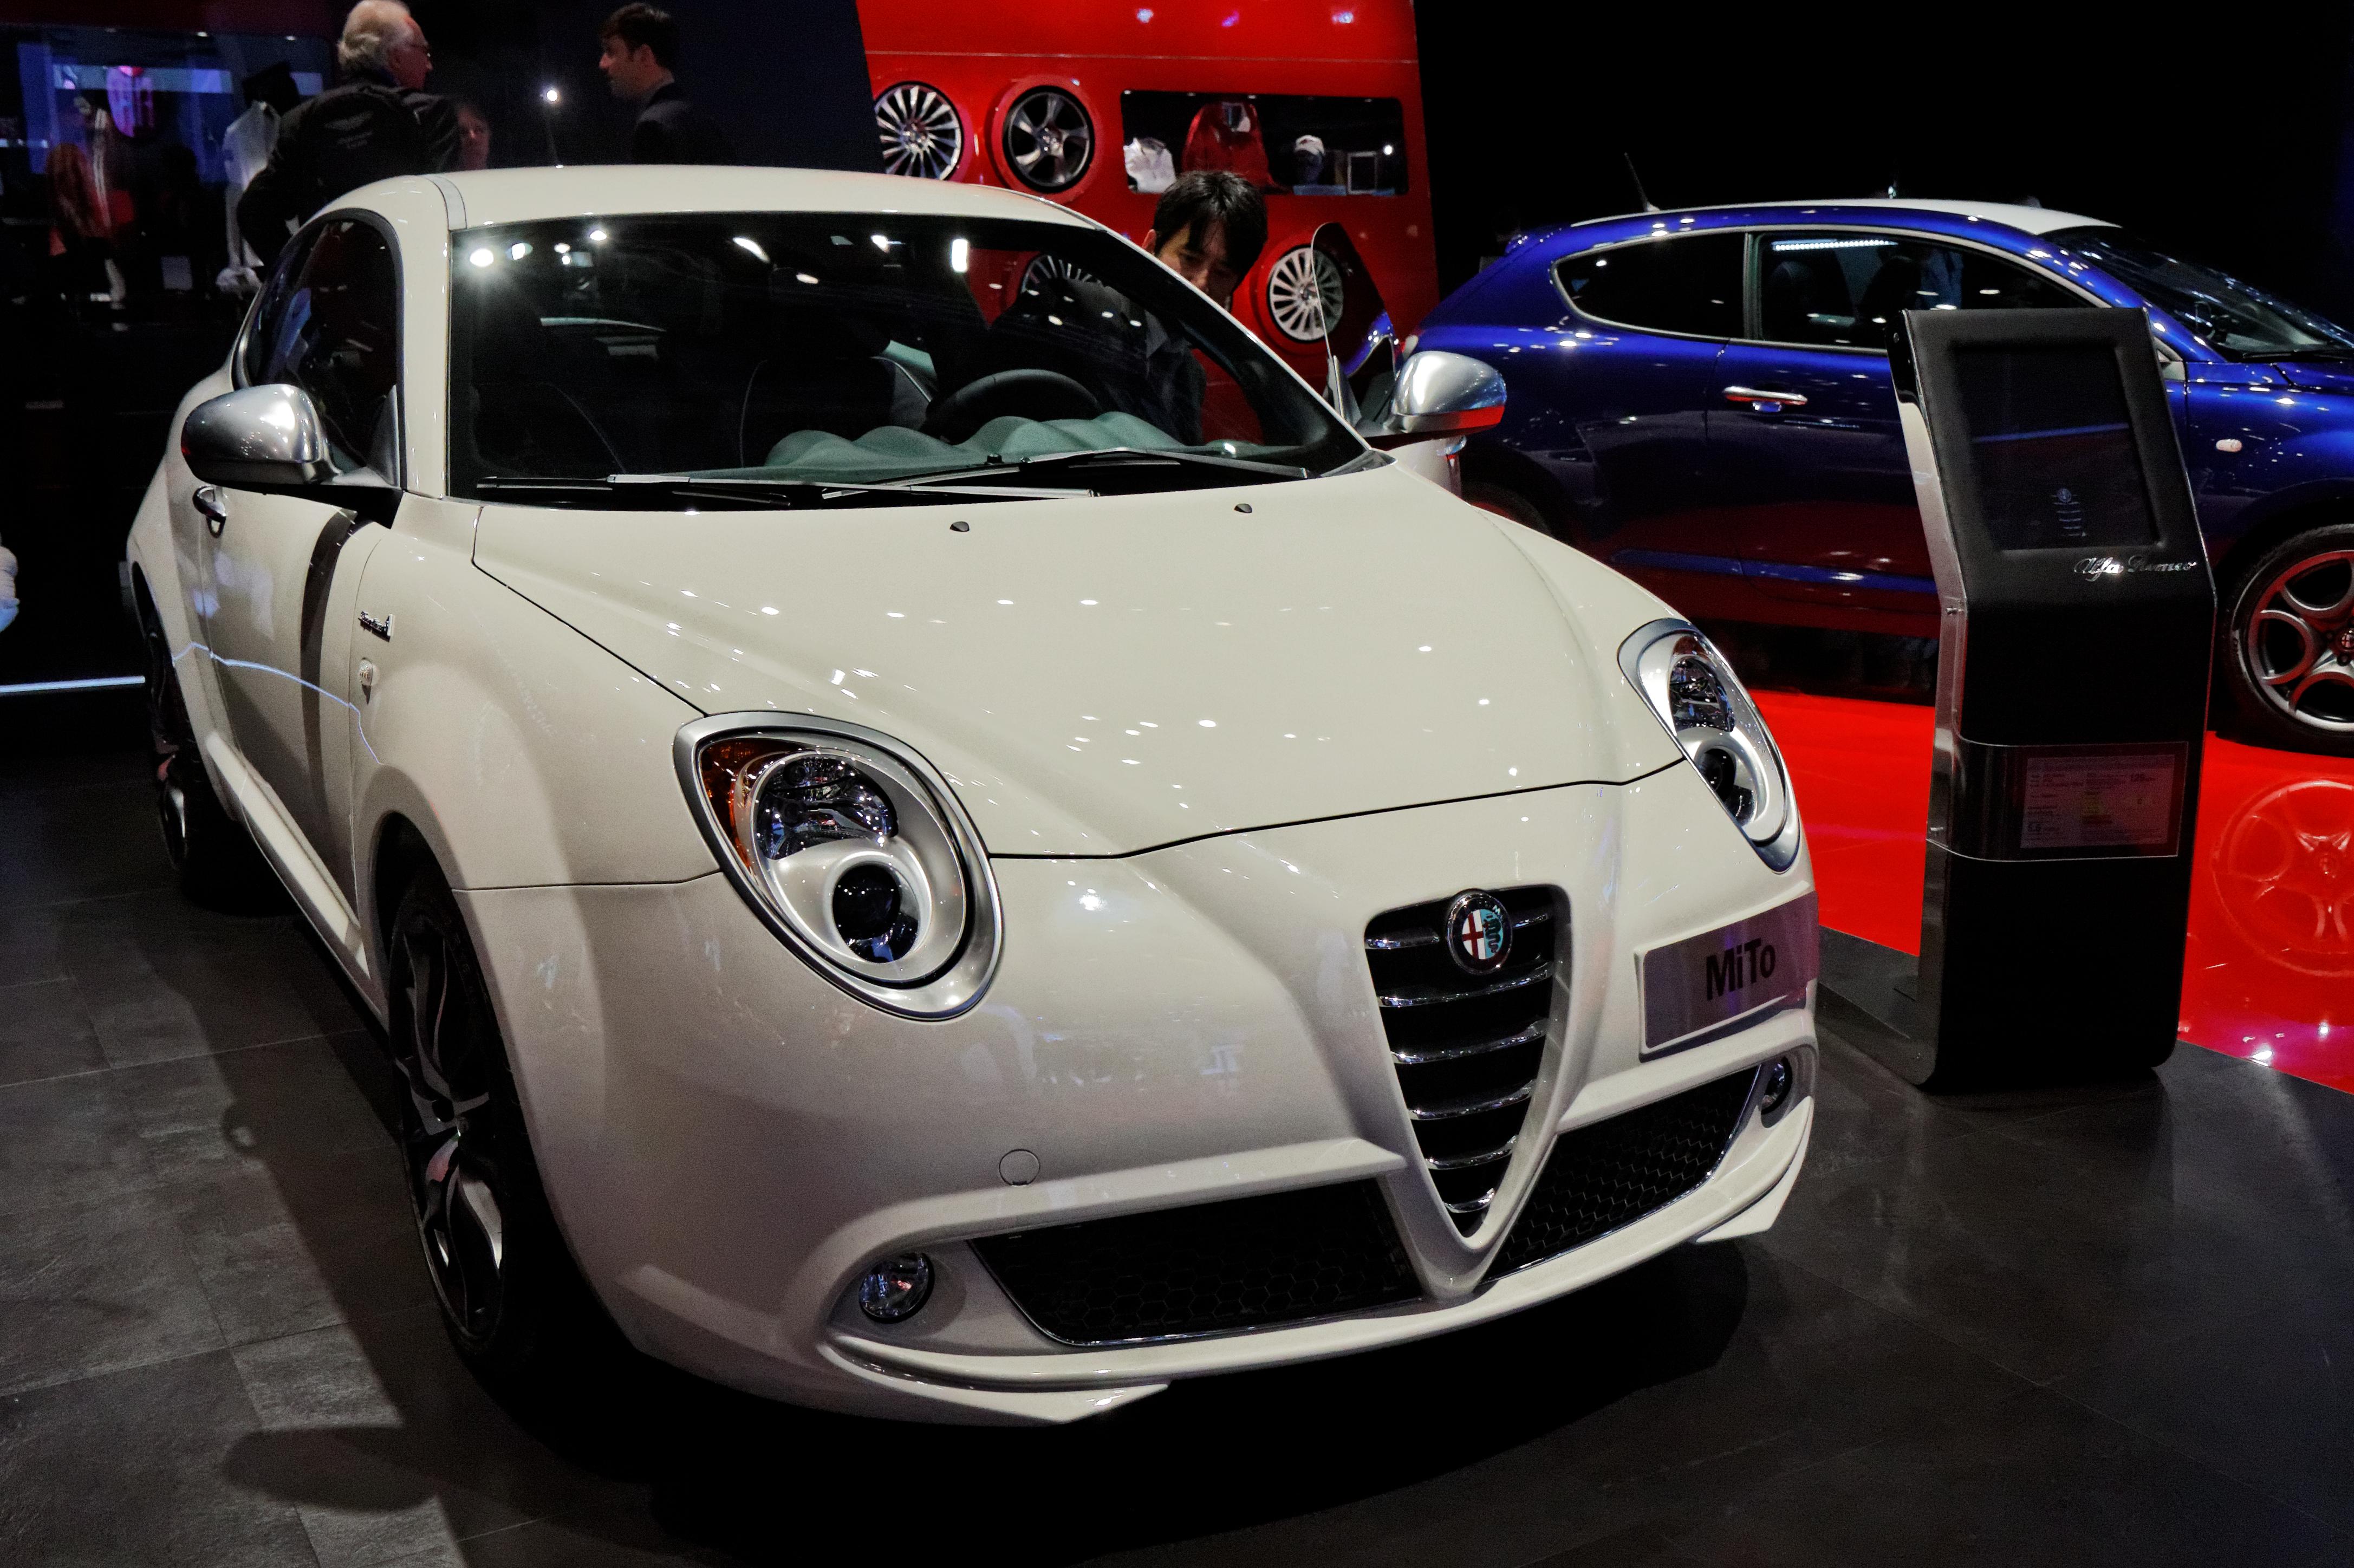 file:alfa romeo mito - mondial de l'automobile de paris 2012 - 005